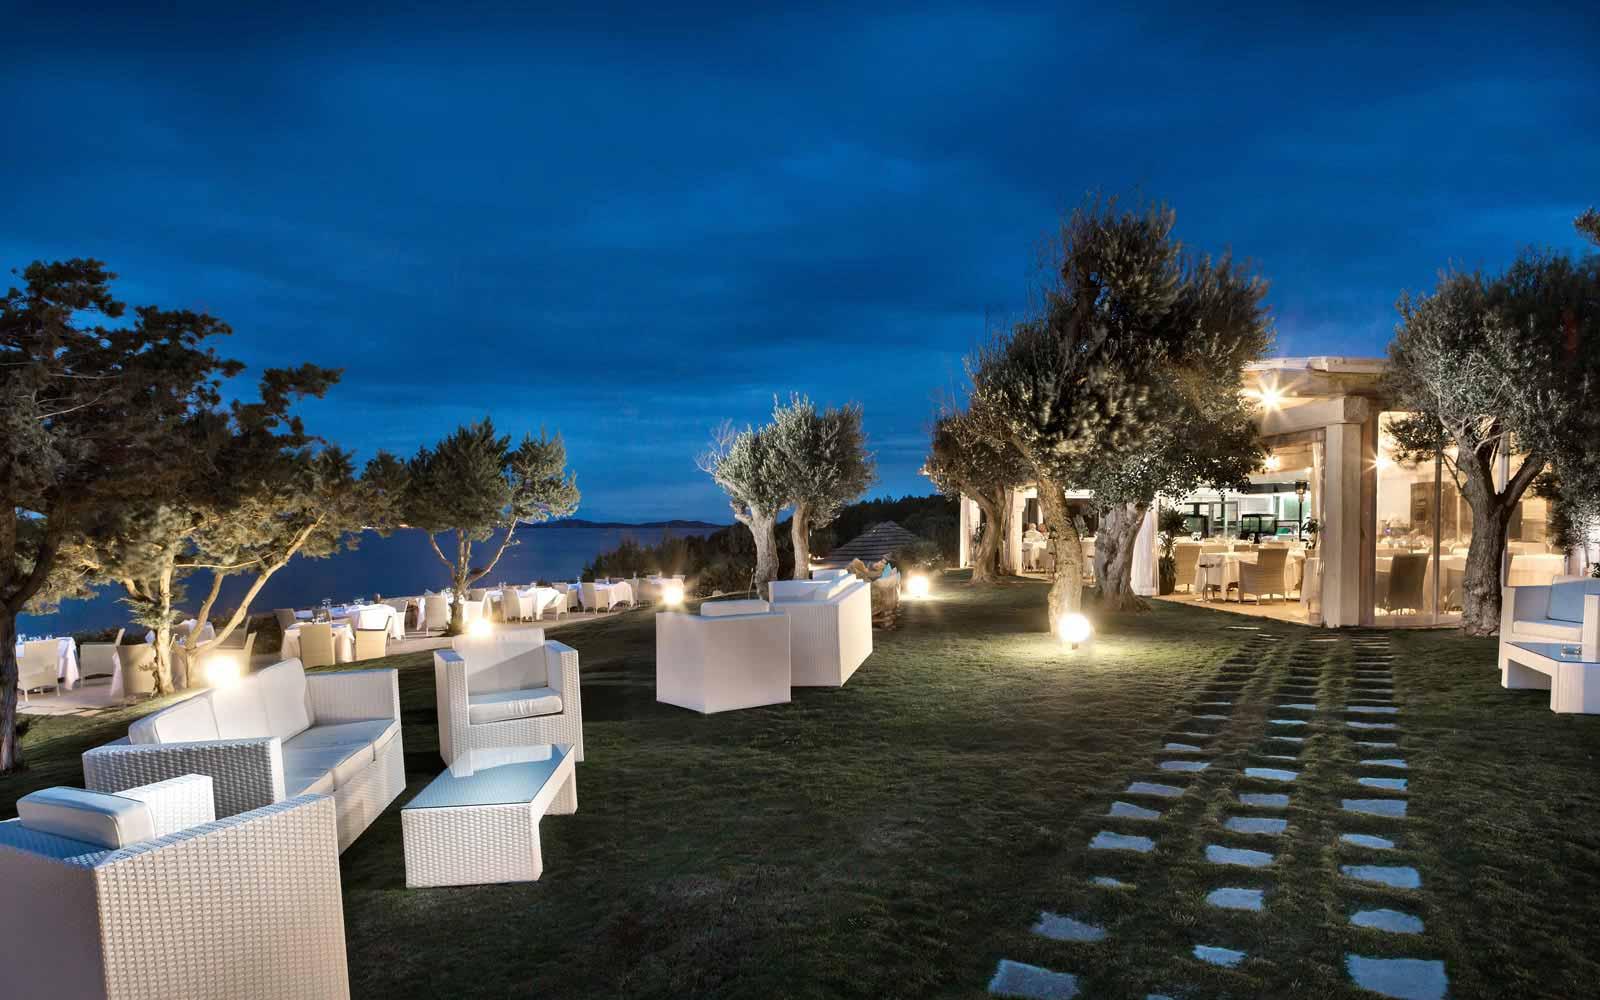 Restaurant night view at Hotel La Rocca Resort & Spa